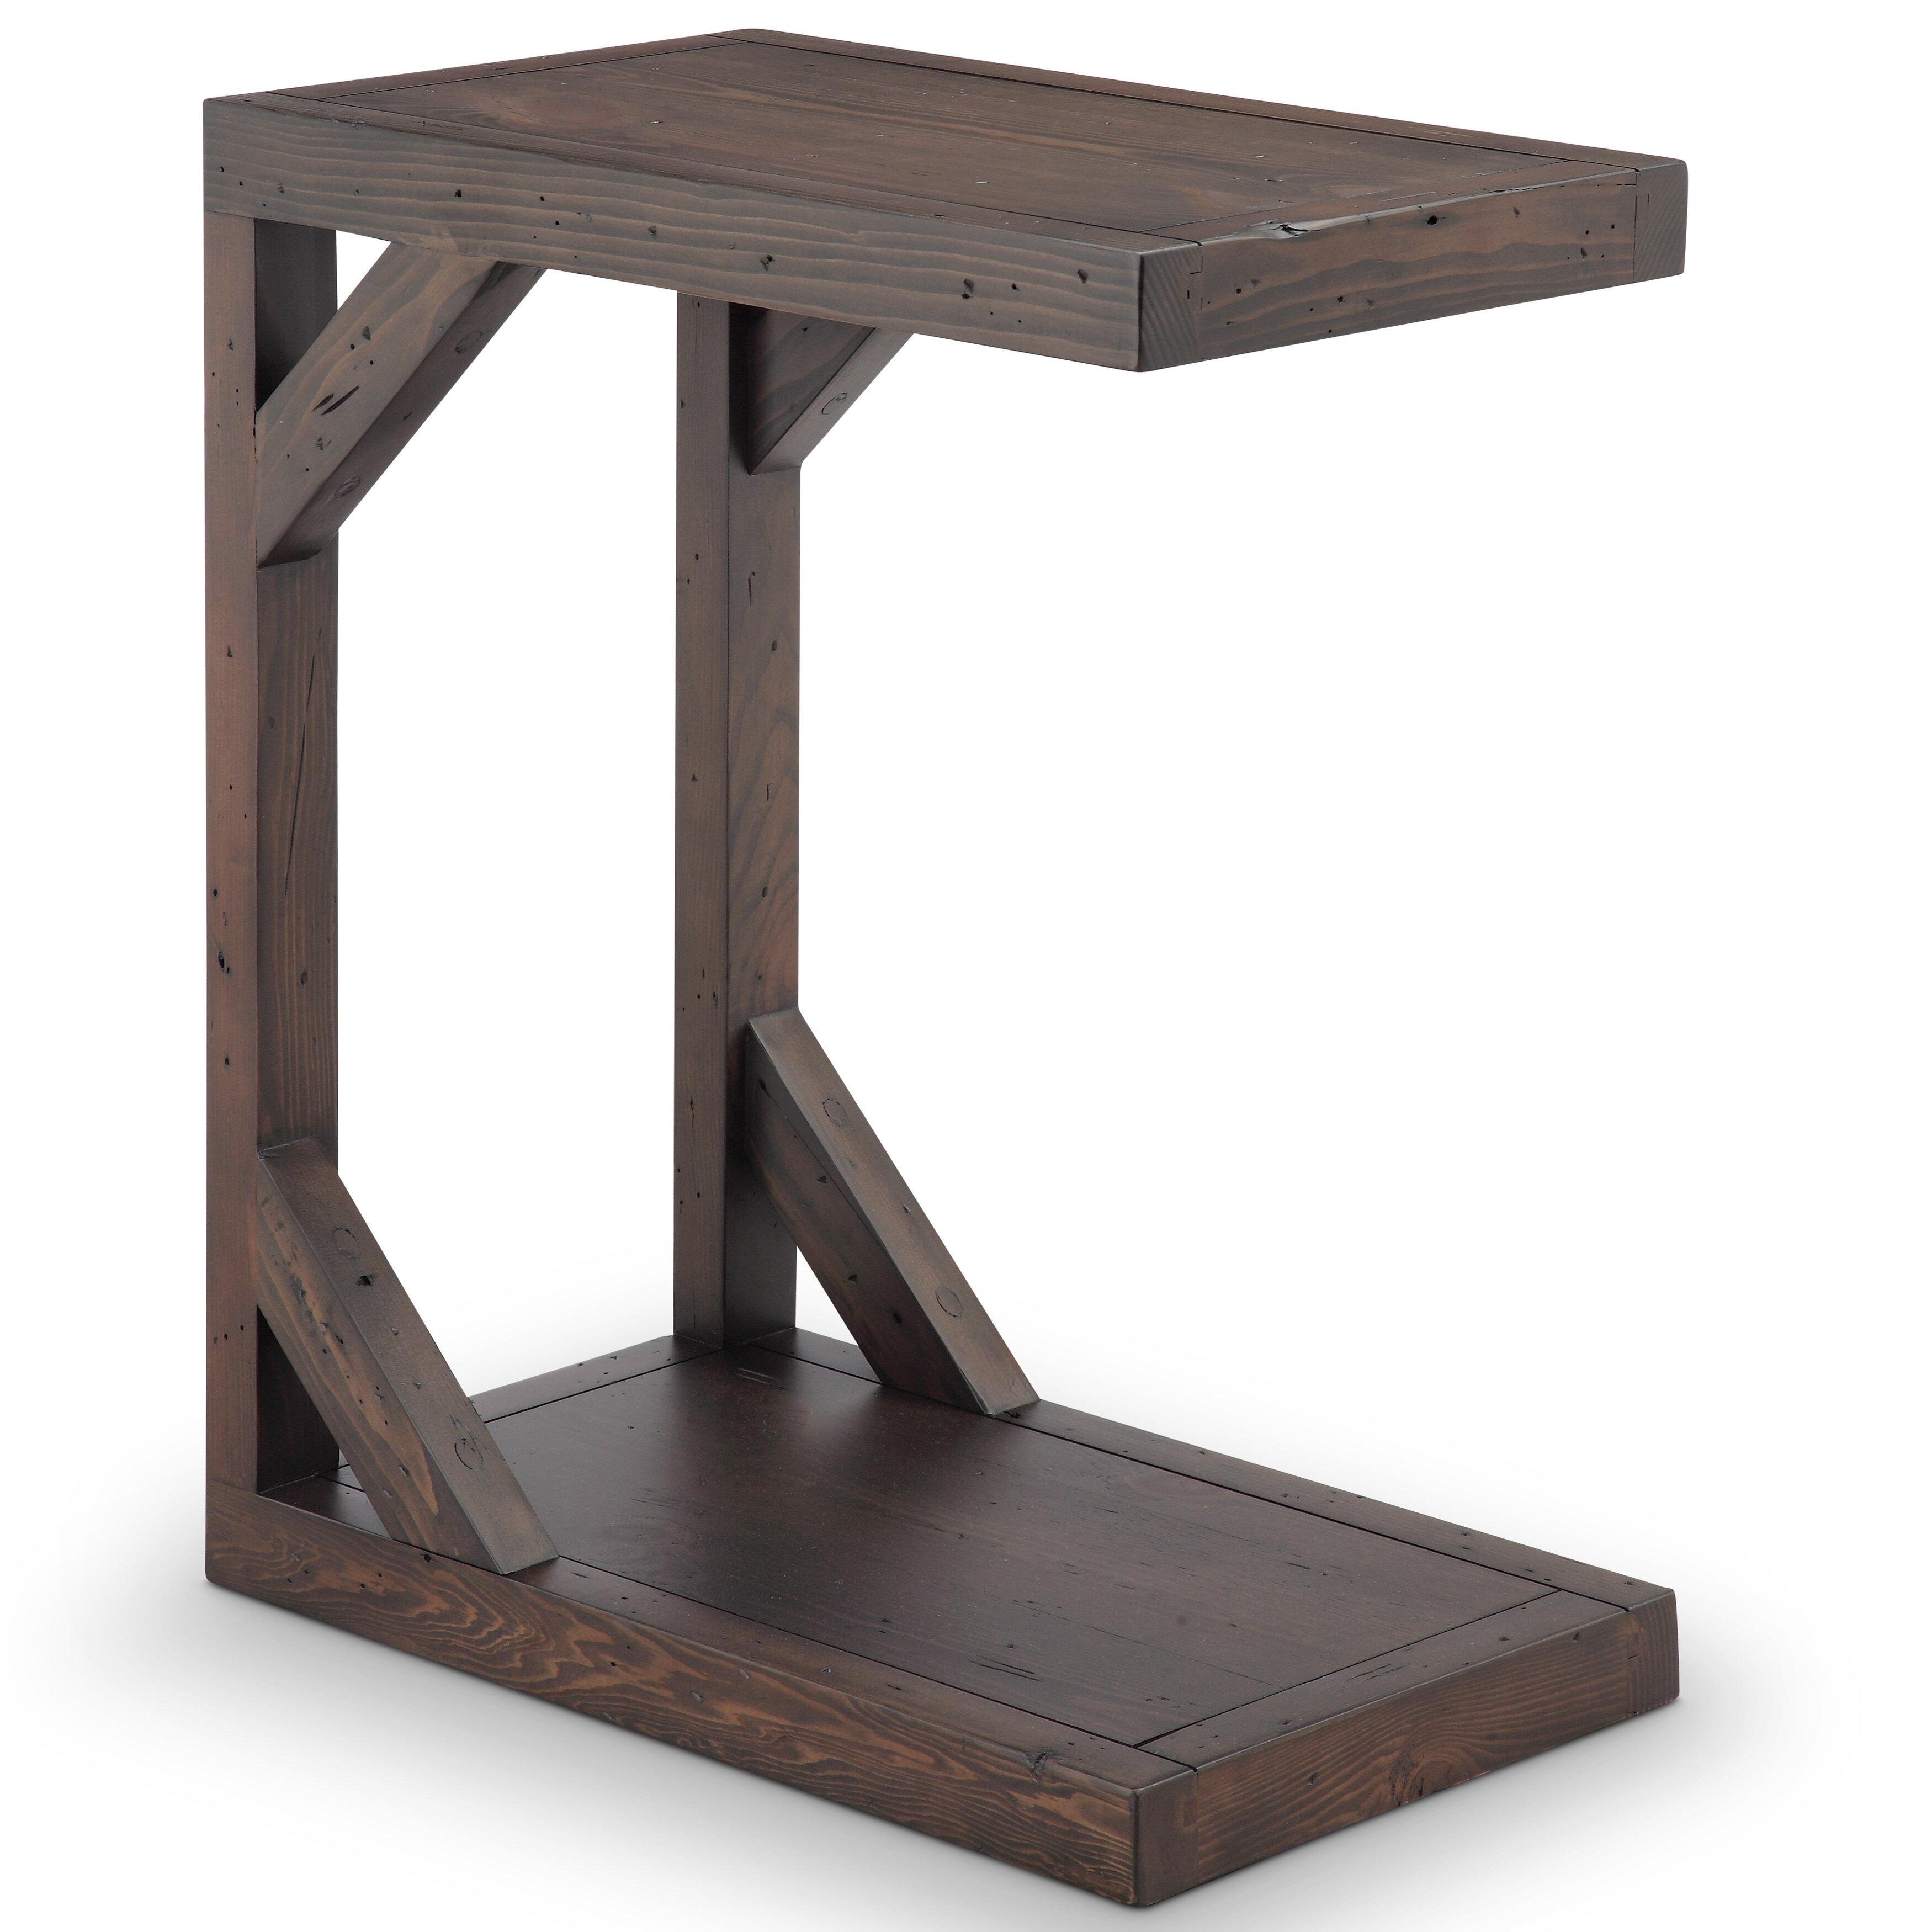 interiors kylin table arlo end wayfair furniture willa pdx reviews shagreen